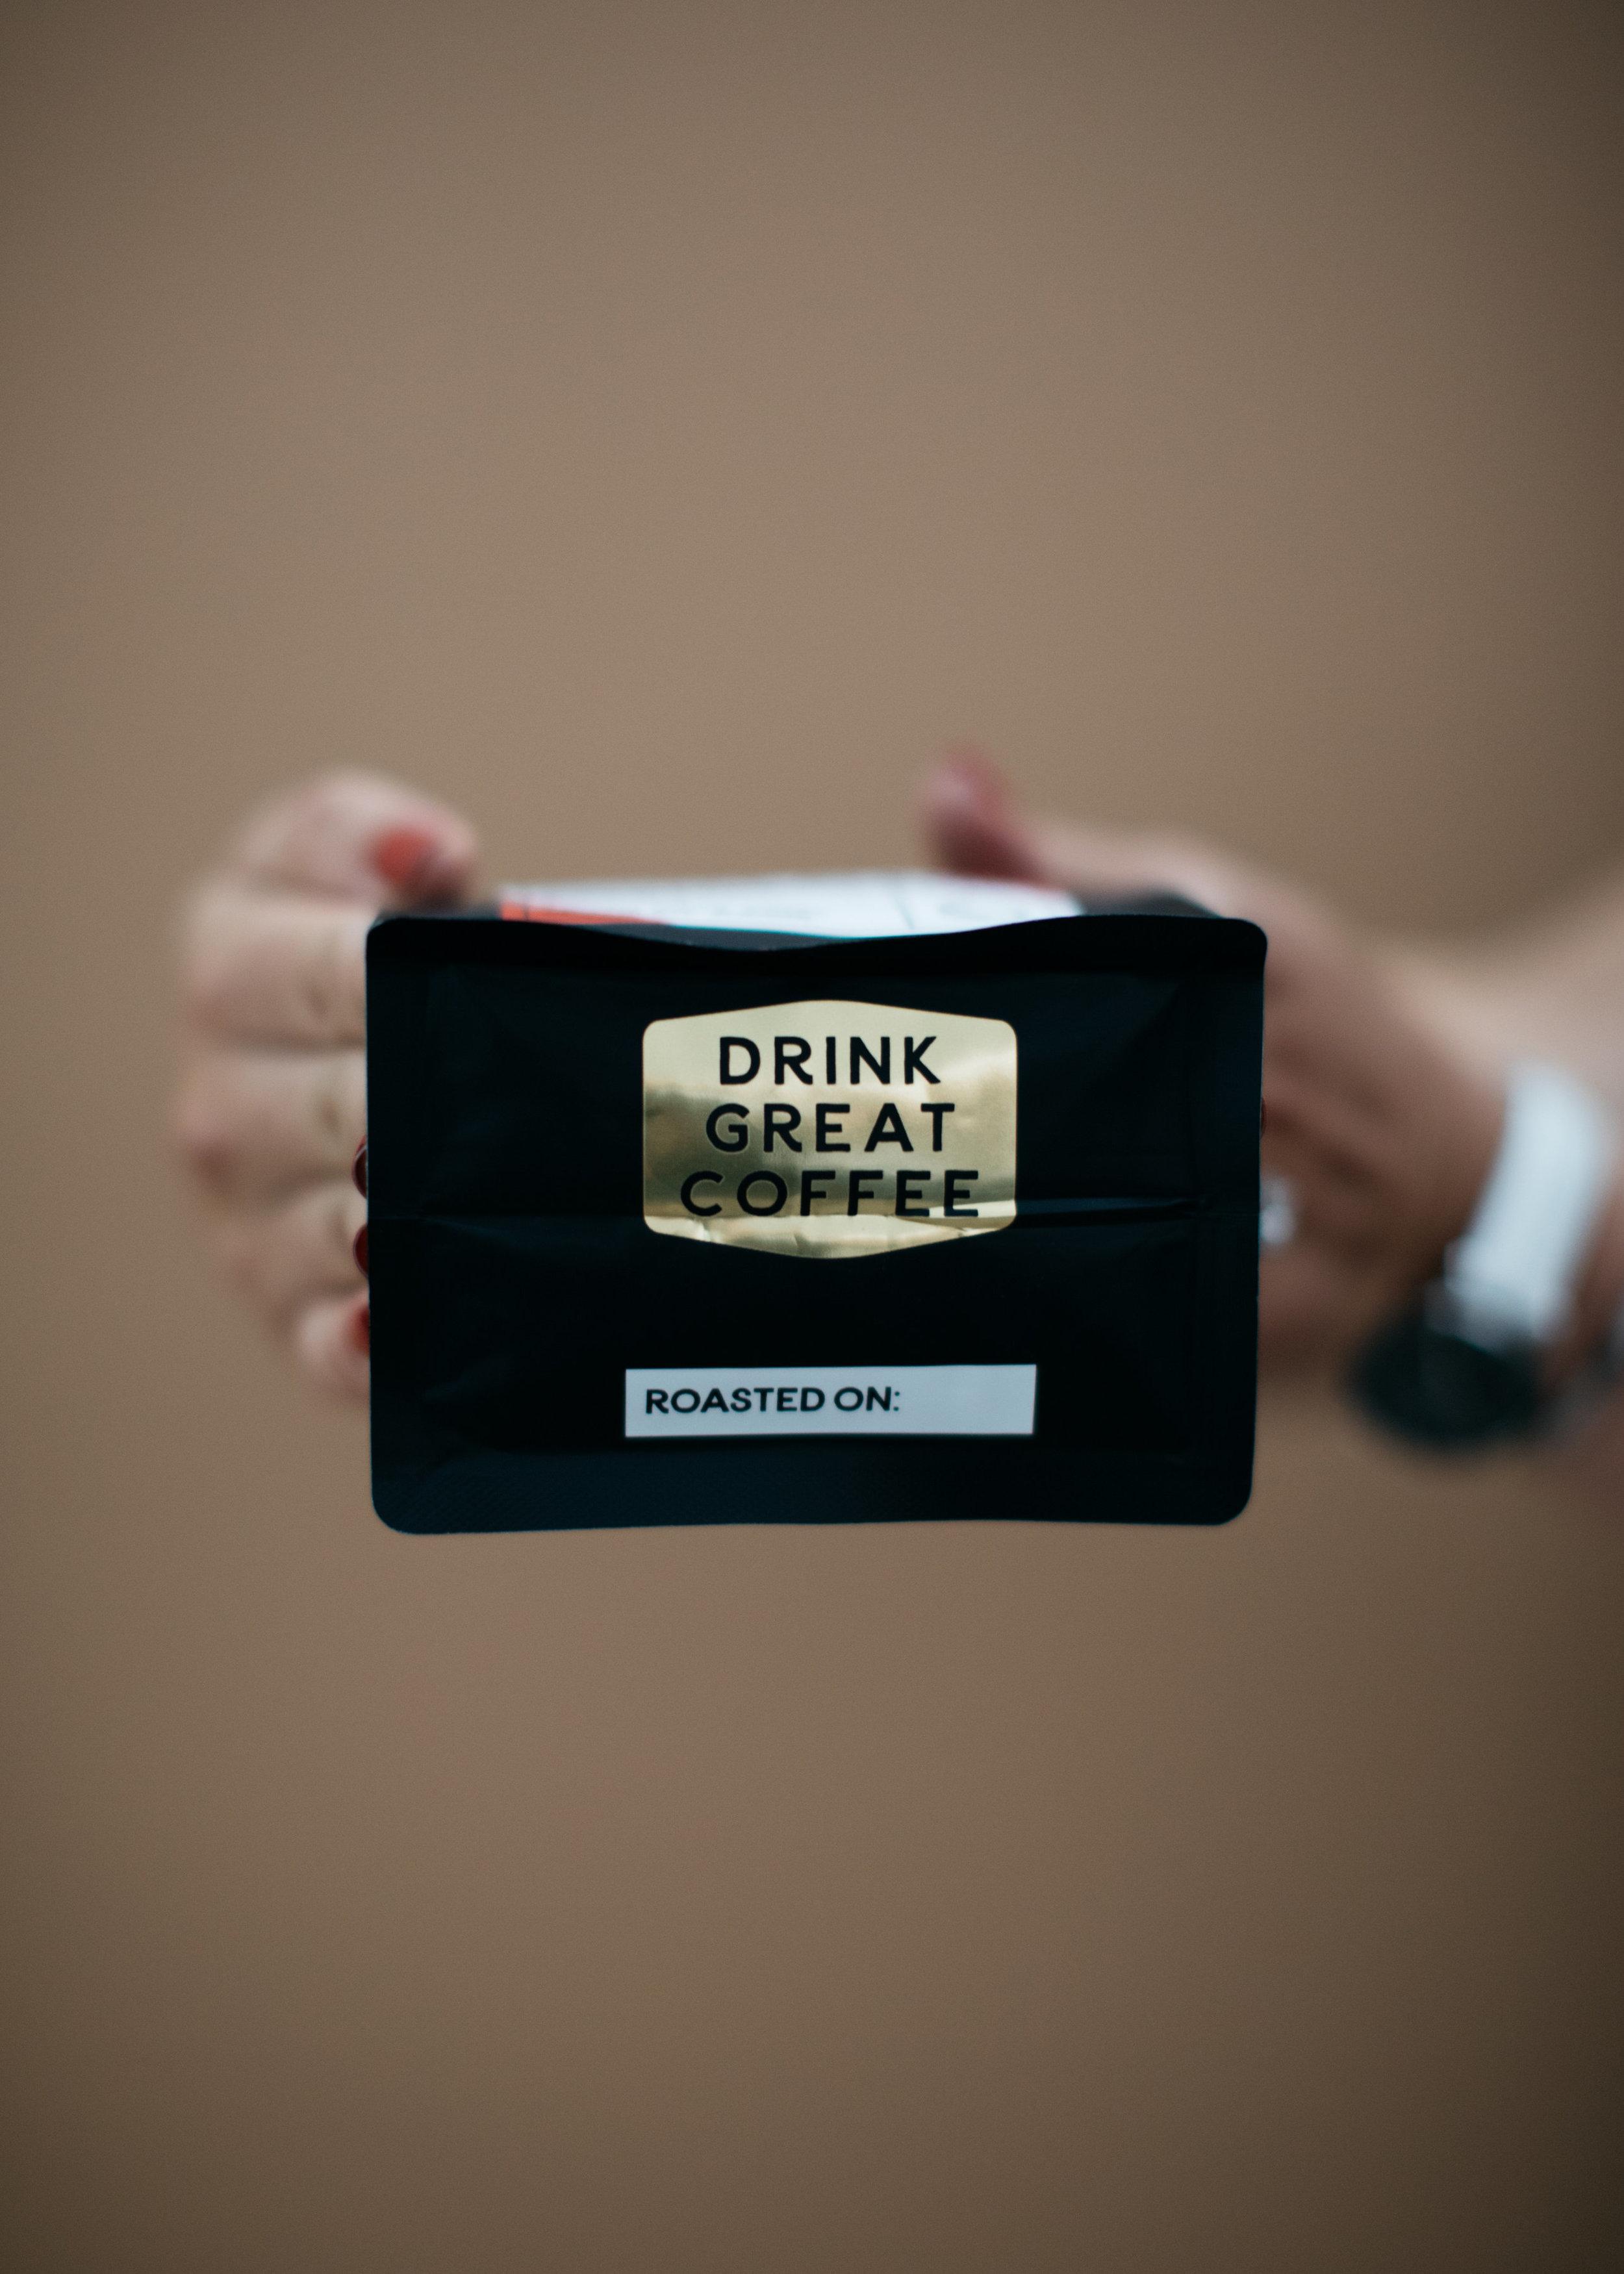 Hold-Fast-Coffee-Colorado-Springs-1.jpg